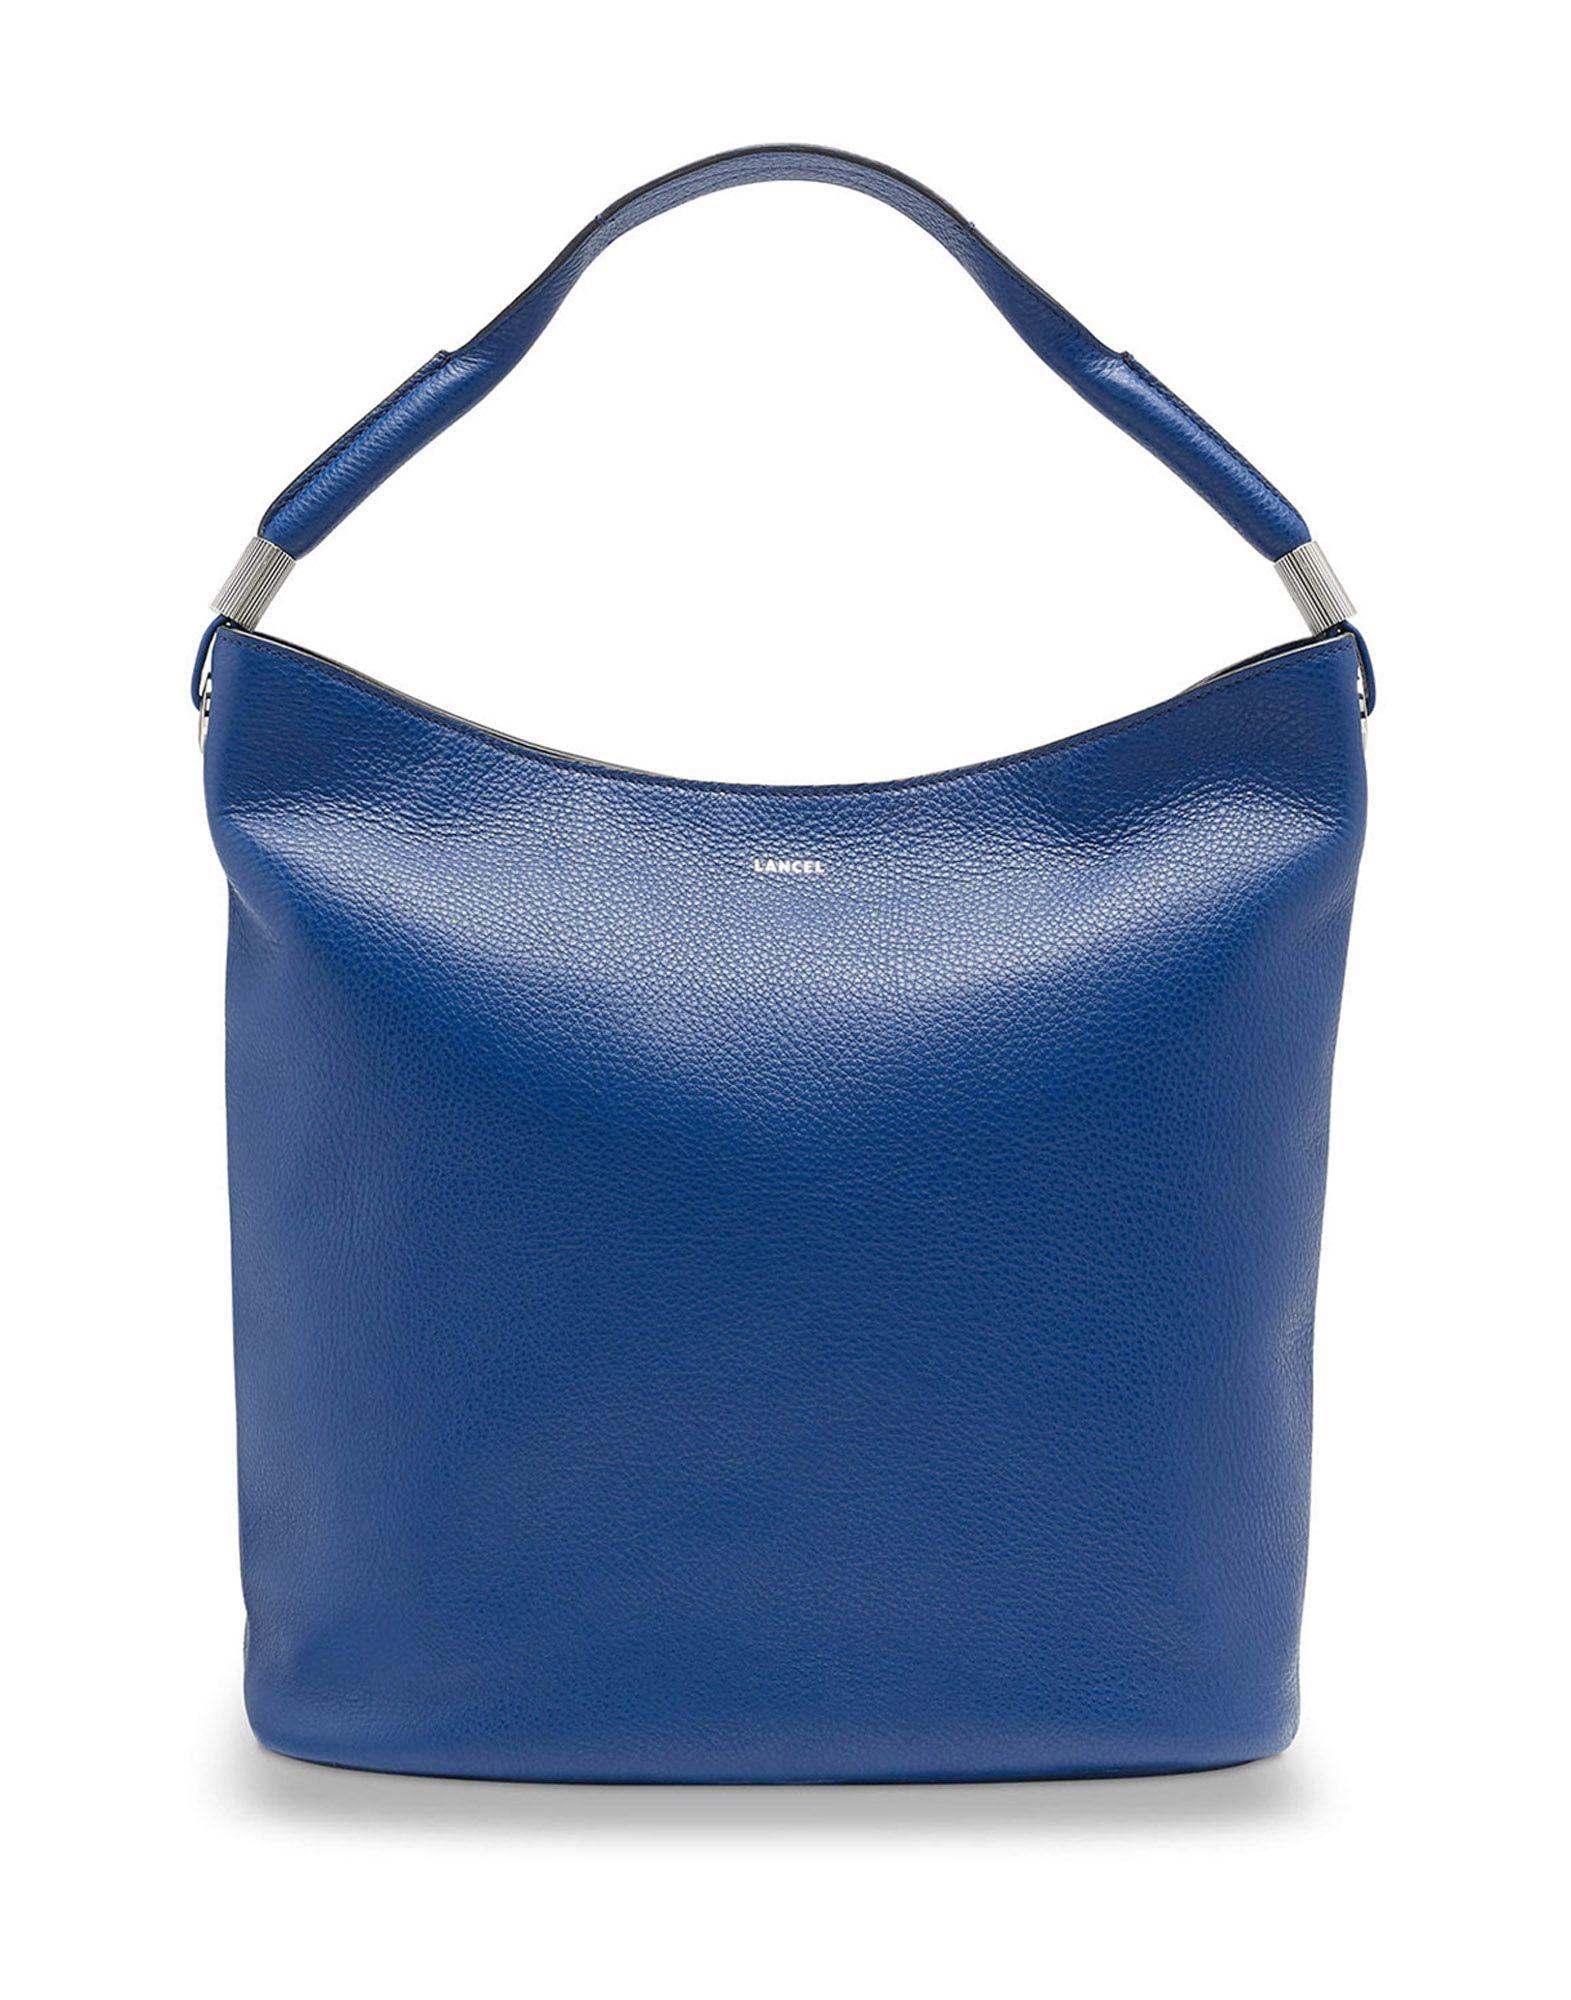 Borsa A Mano Lancel Flore Grained Leather - Donna - Acquista online su